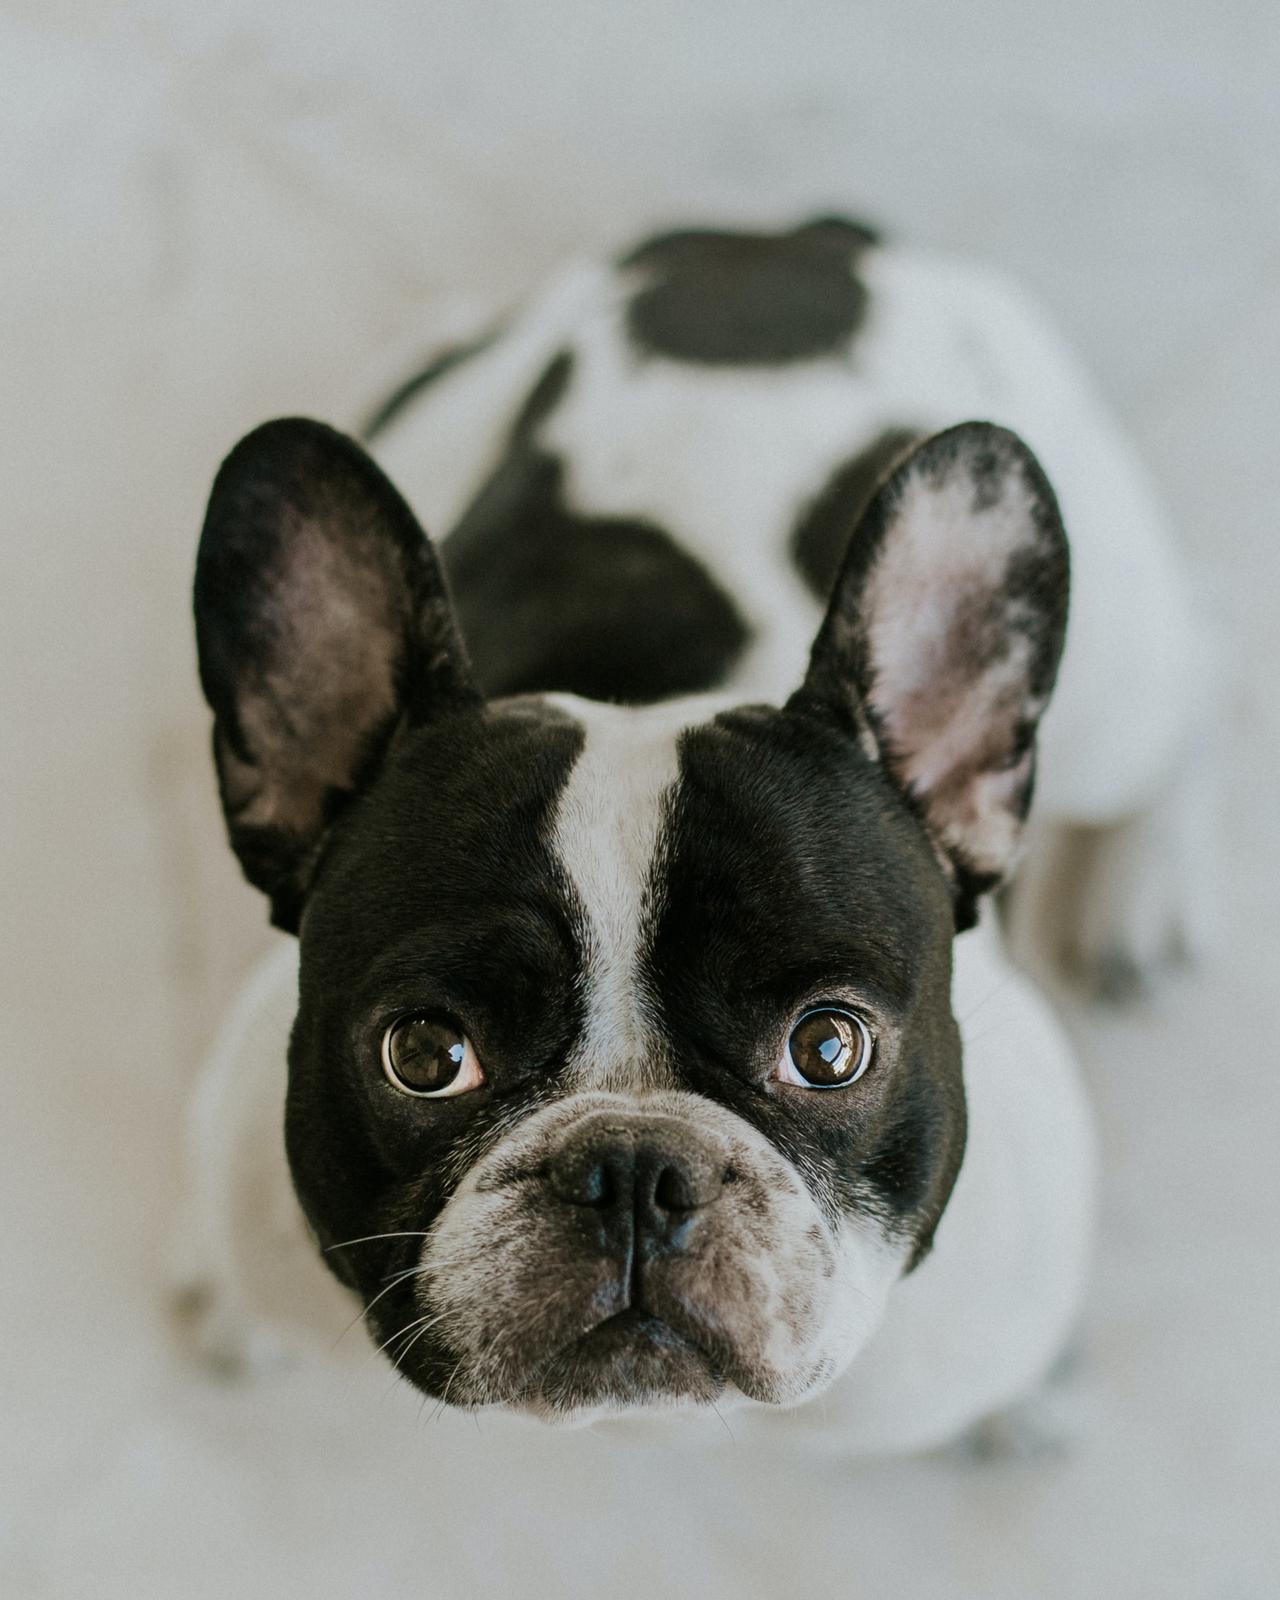 Ways you can get French bulldog financing in California